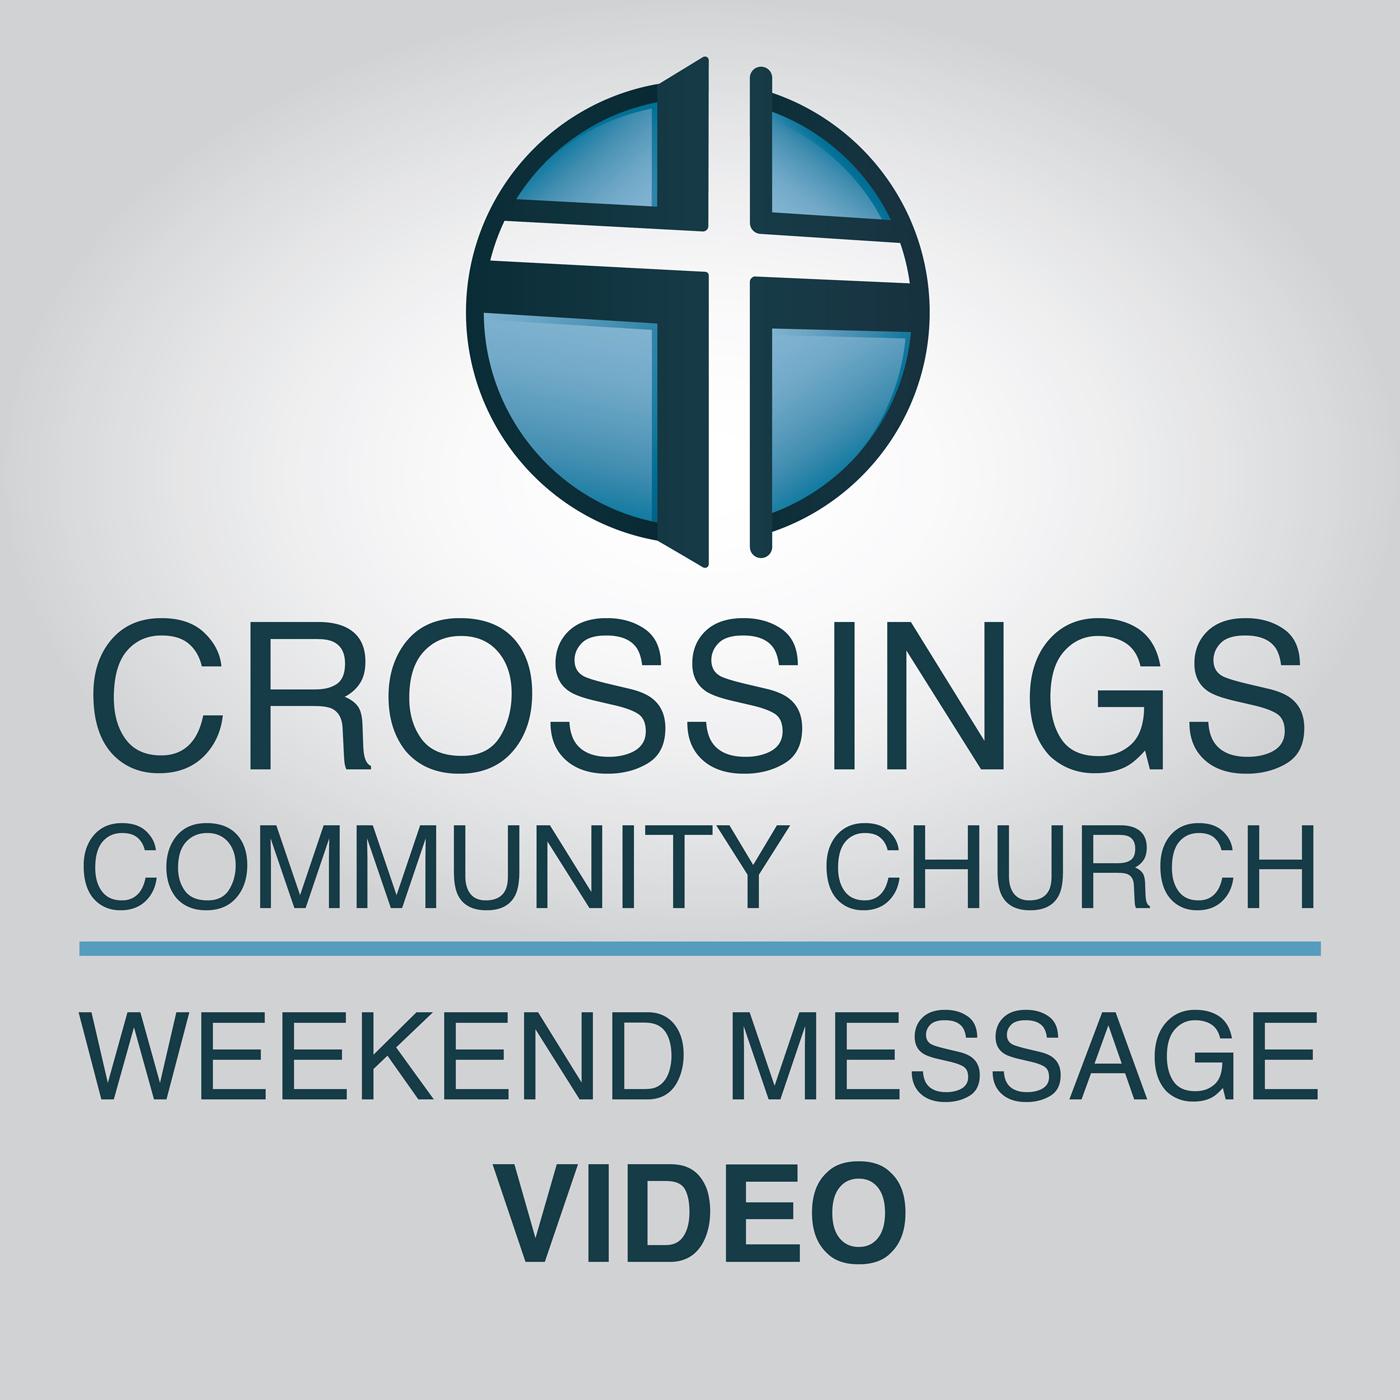 Crossings Community Church - Video